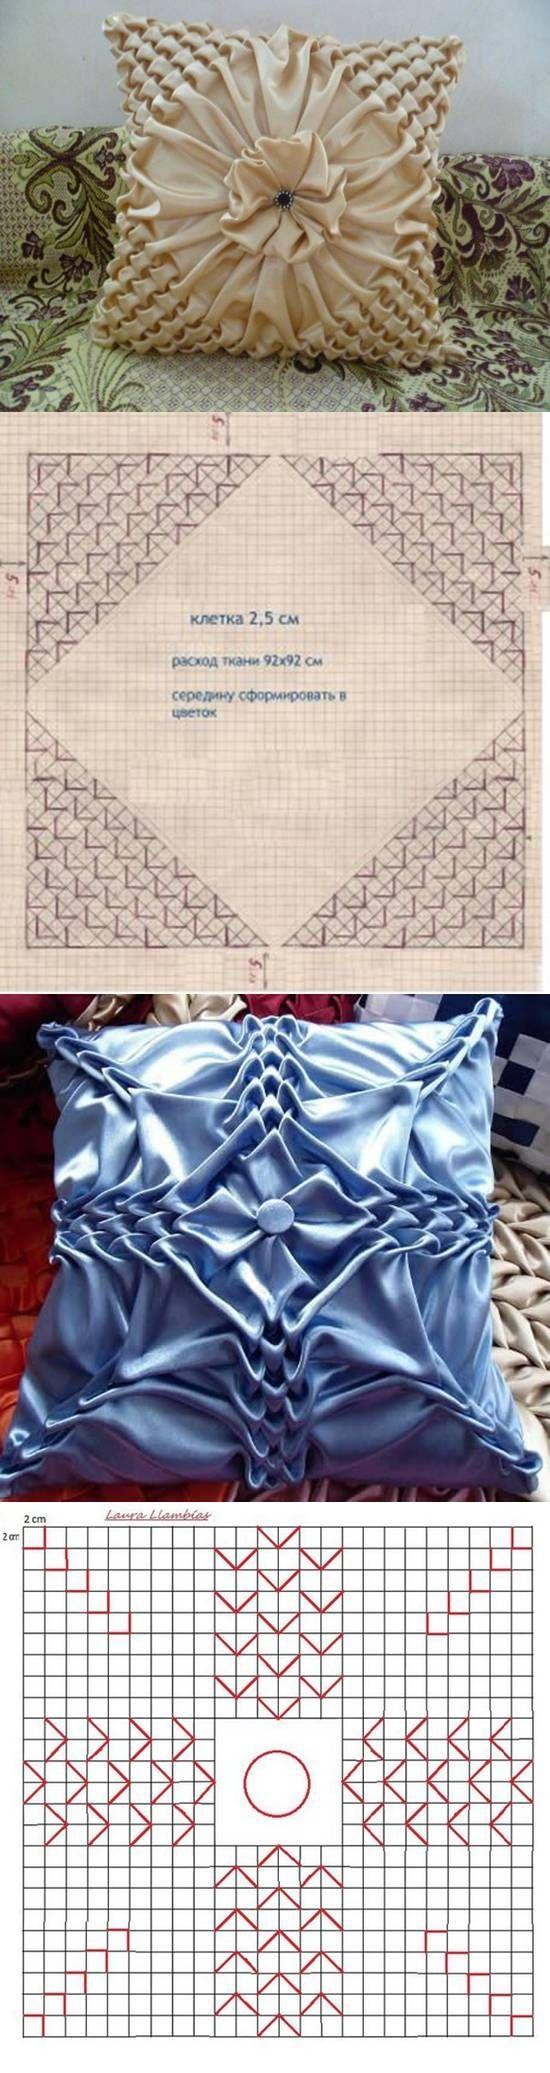 DIY Pillow Patterns Puffed Sleeves DIY Pillow Patterns Puffed Sleeves by diyforever